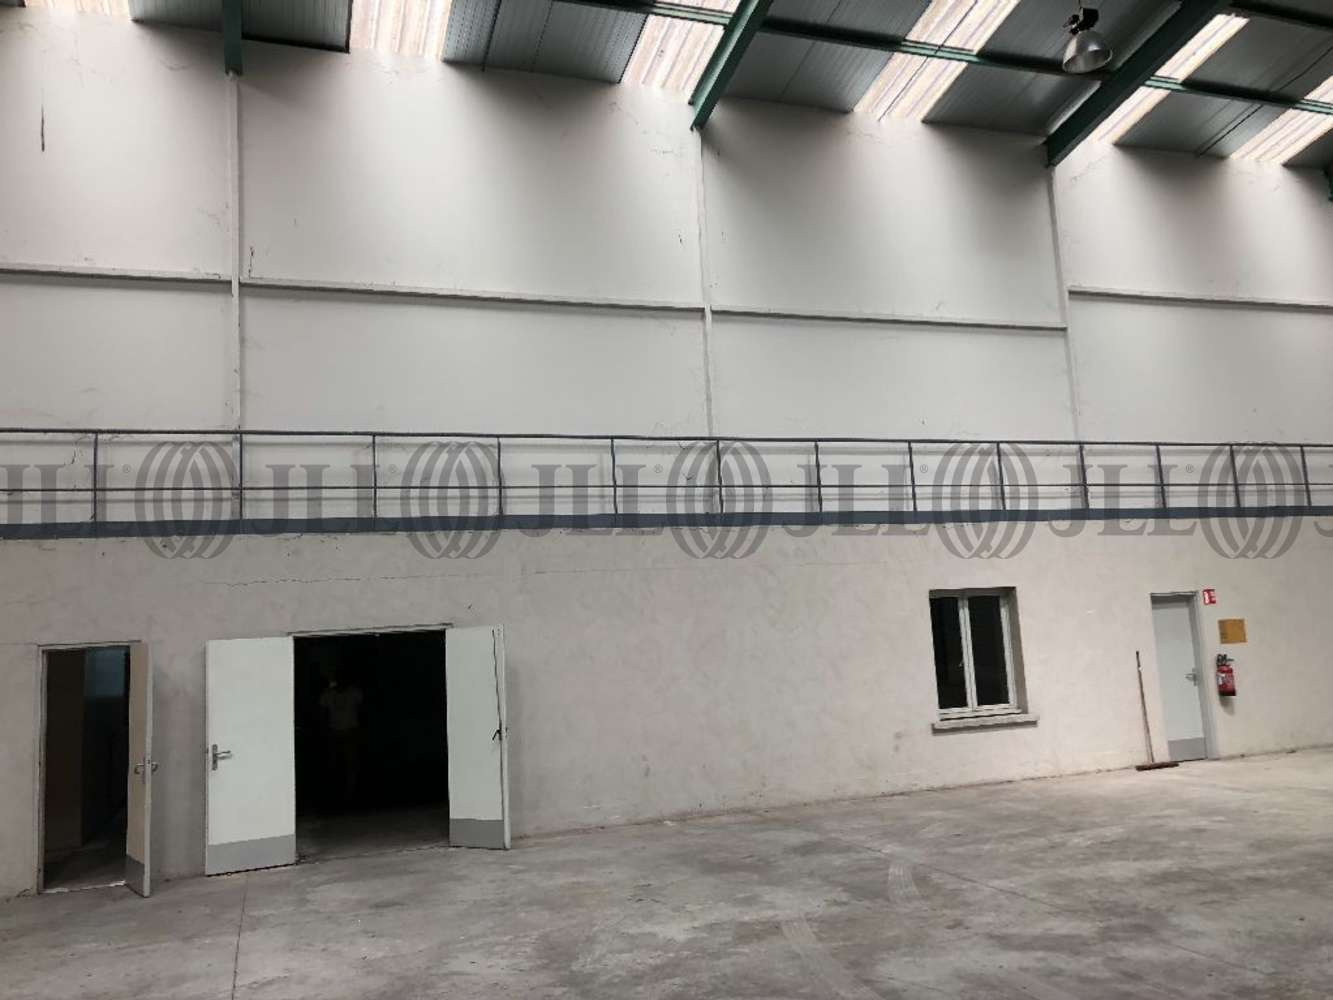 Activités/entrepôt Provins, 77160 - ZAE DE LA GARE - 9617799